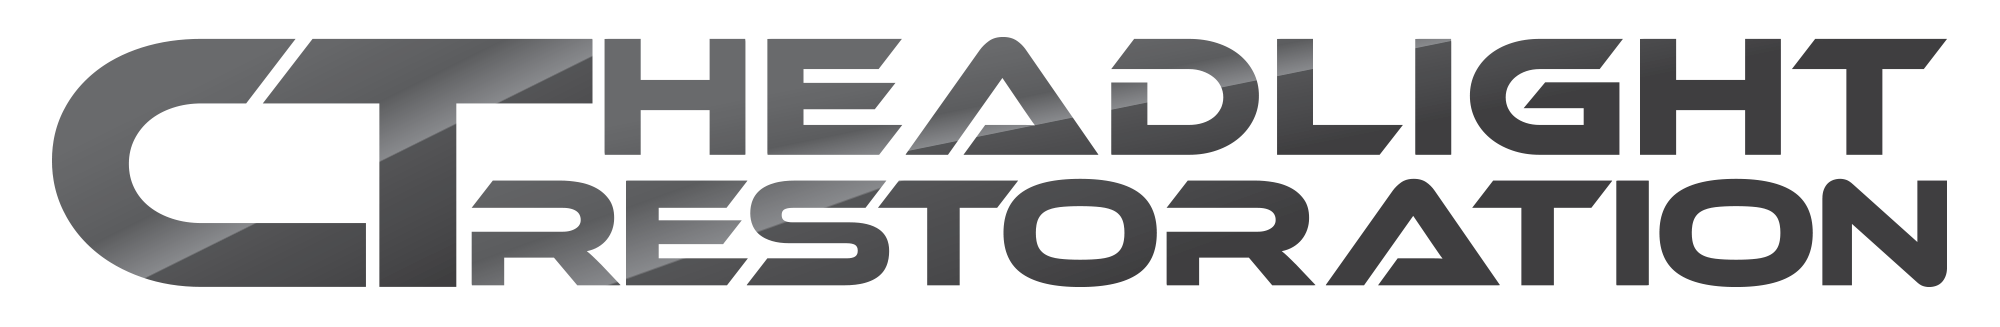 CT Headlight Restoration Logo